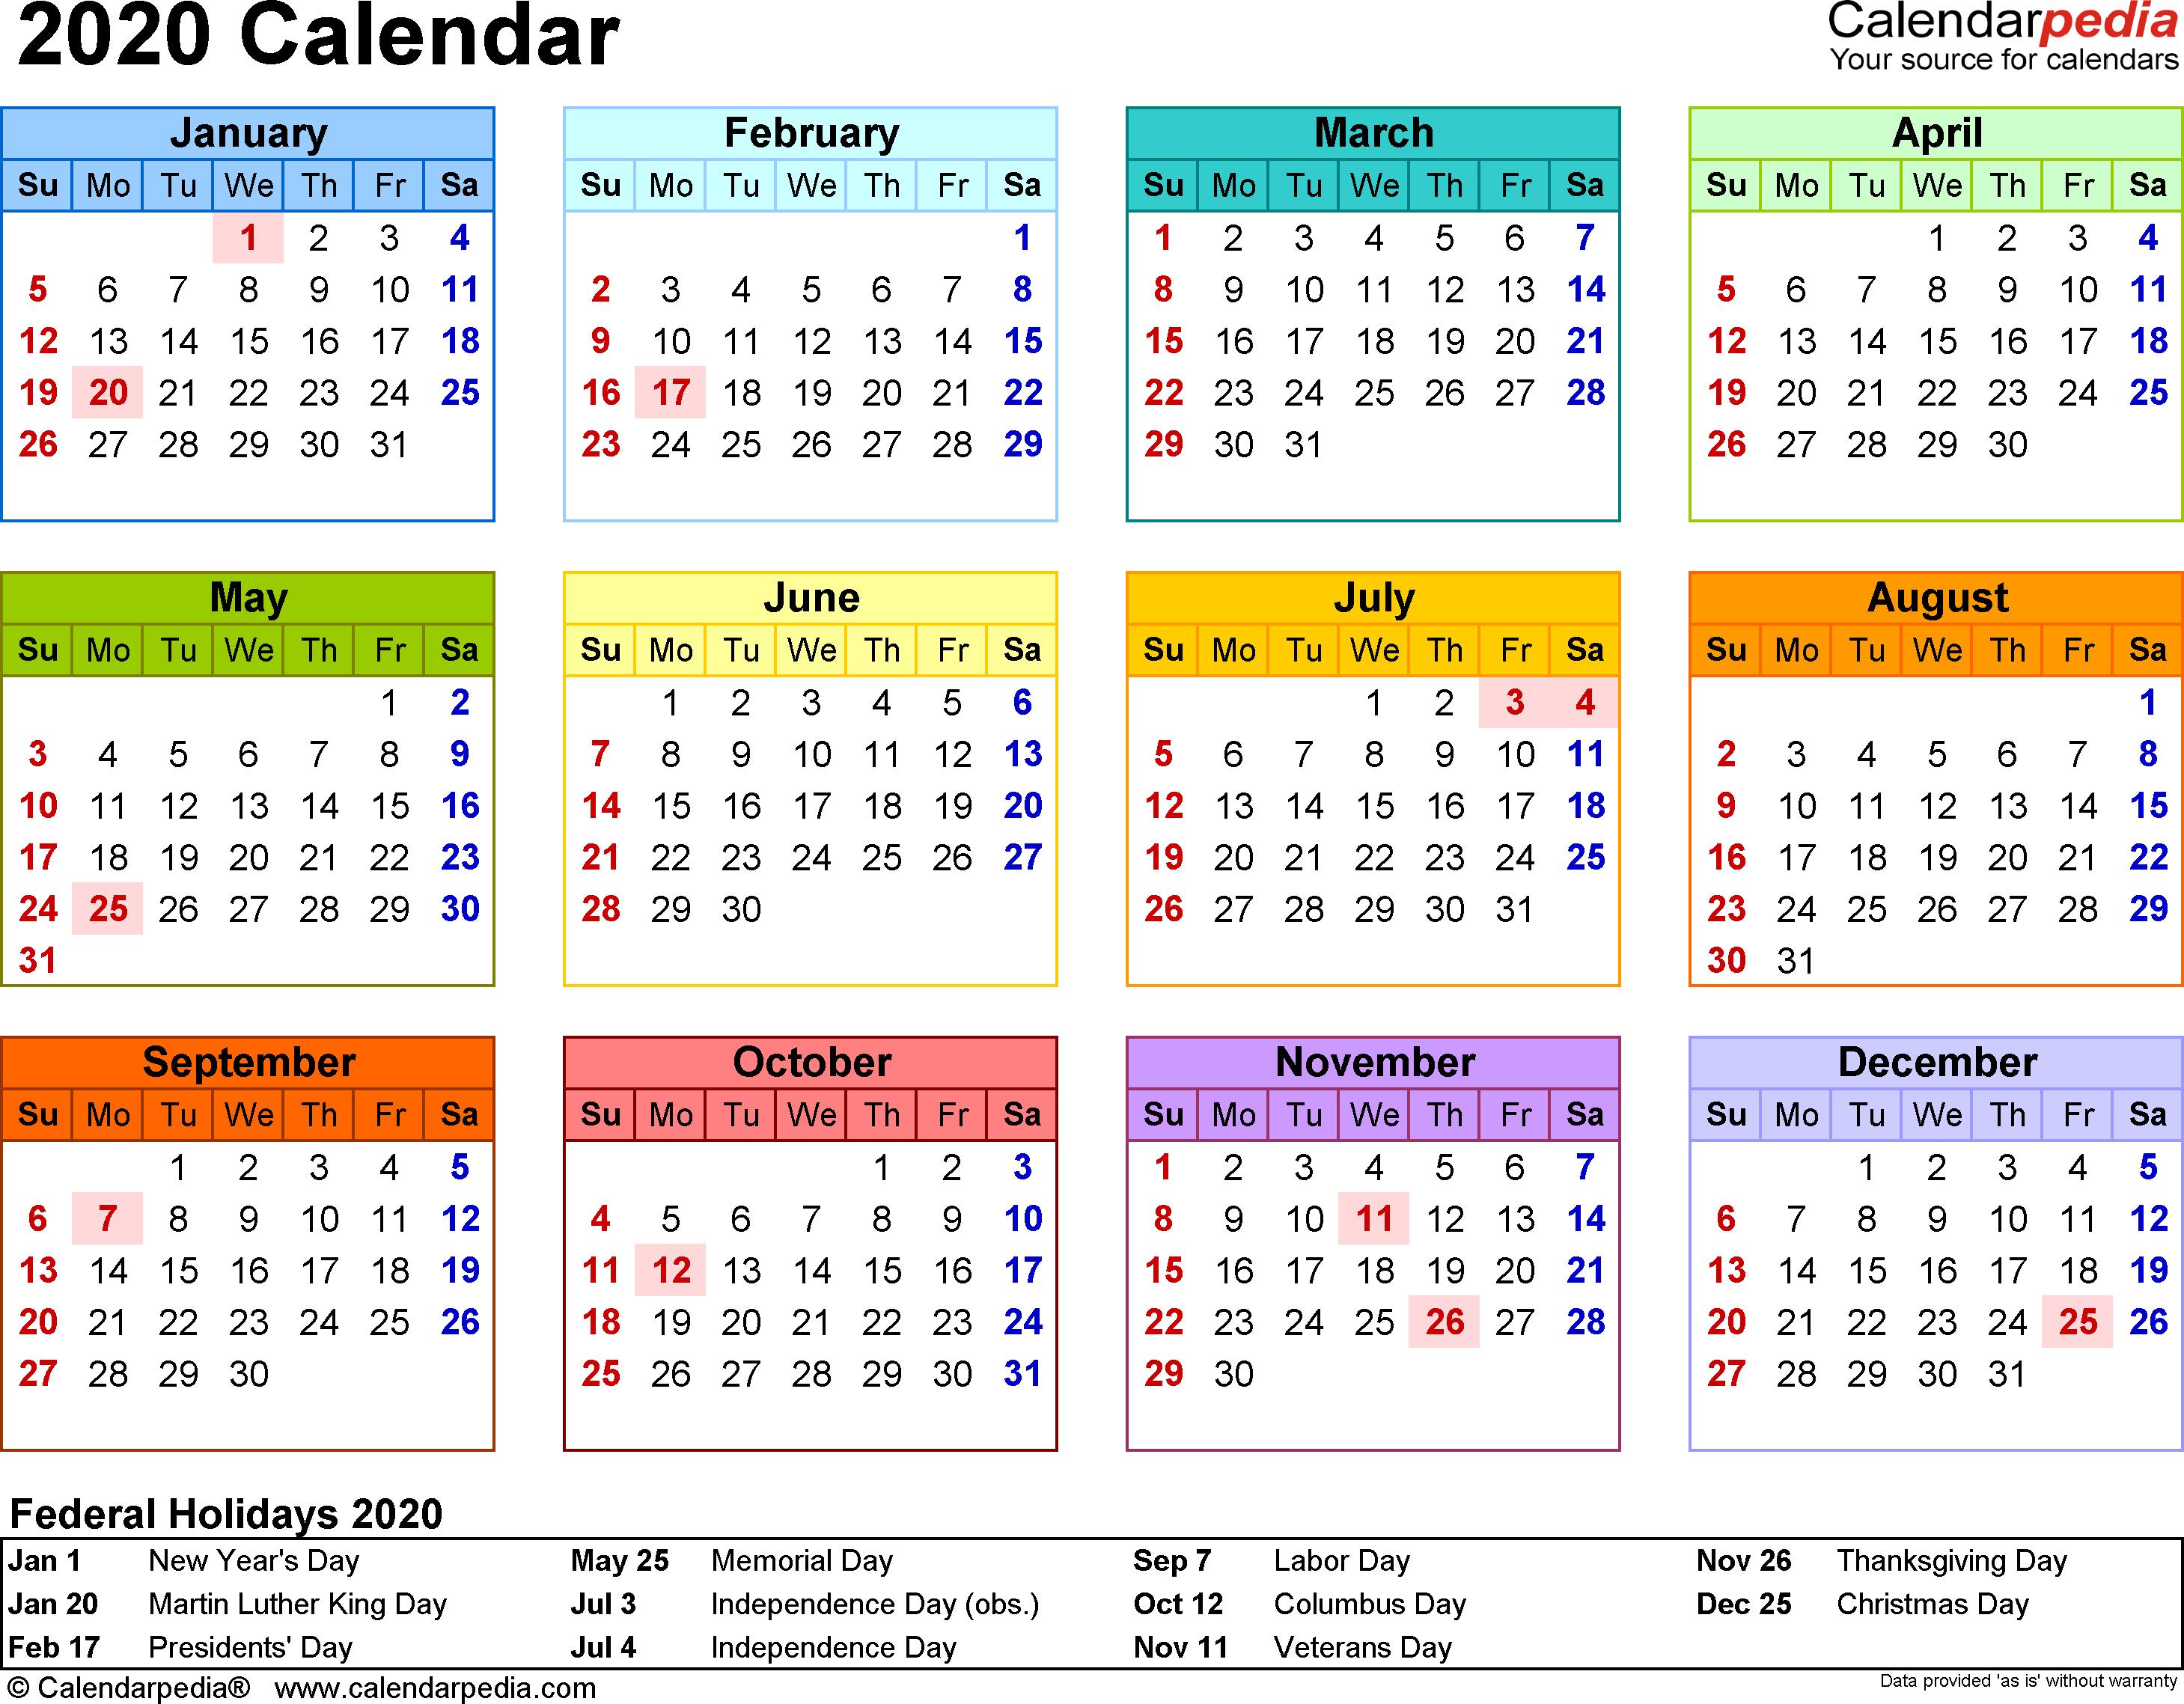 2020 Calendar Print Out - Wpa.wpart.co